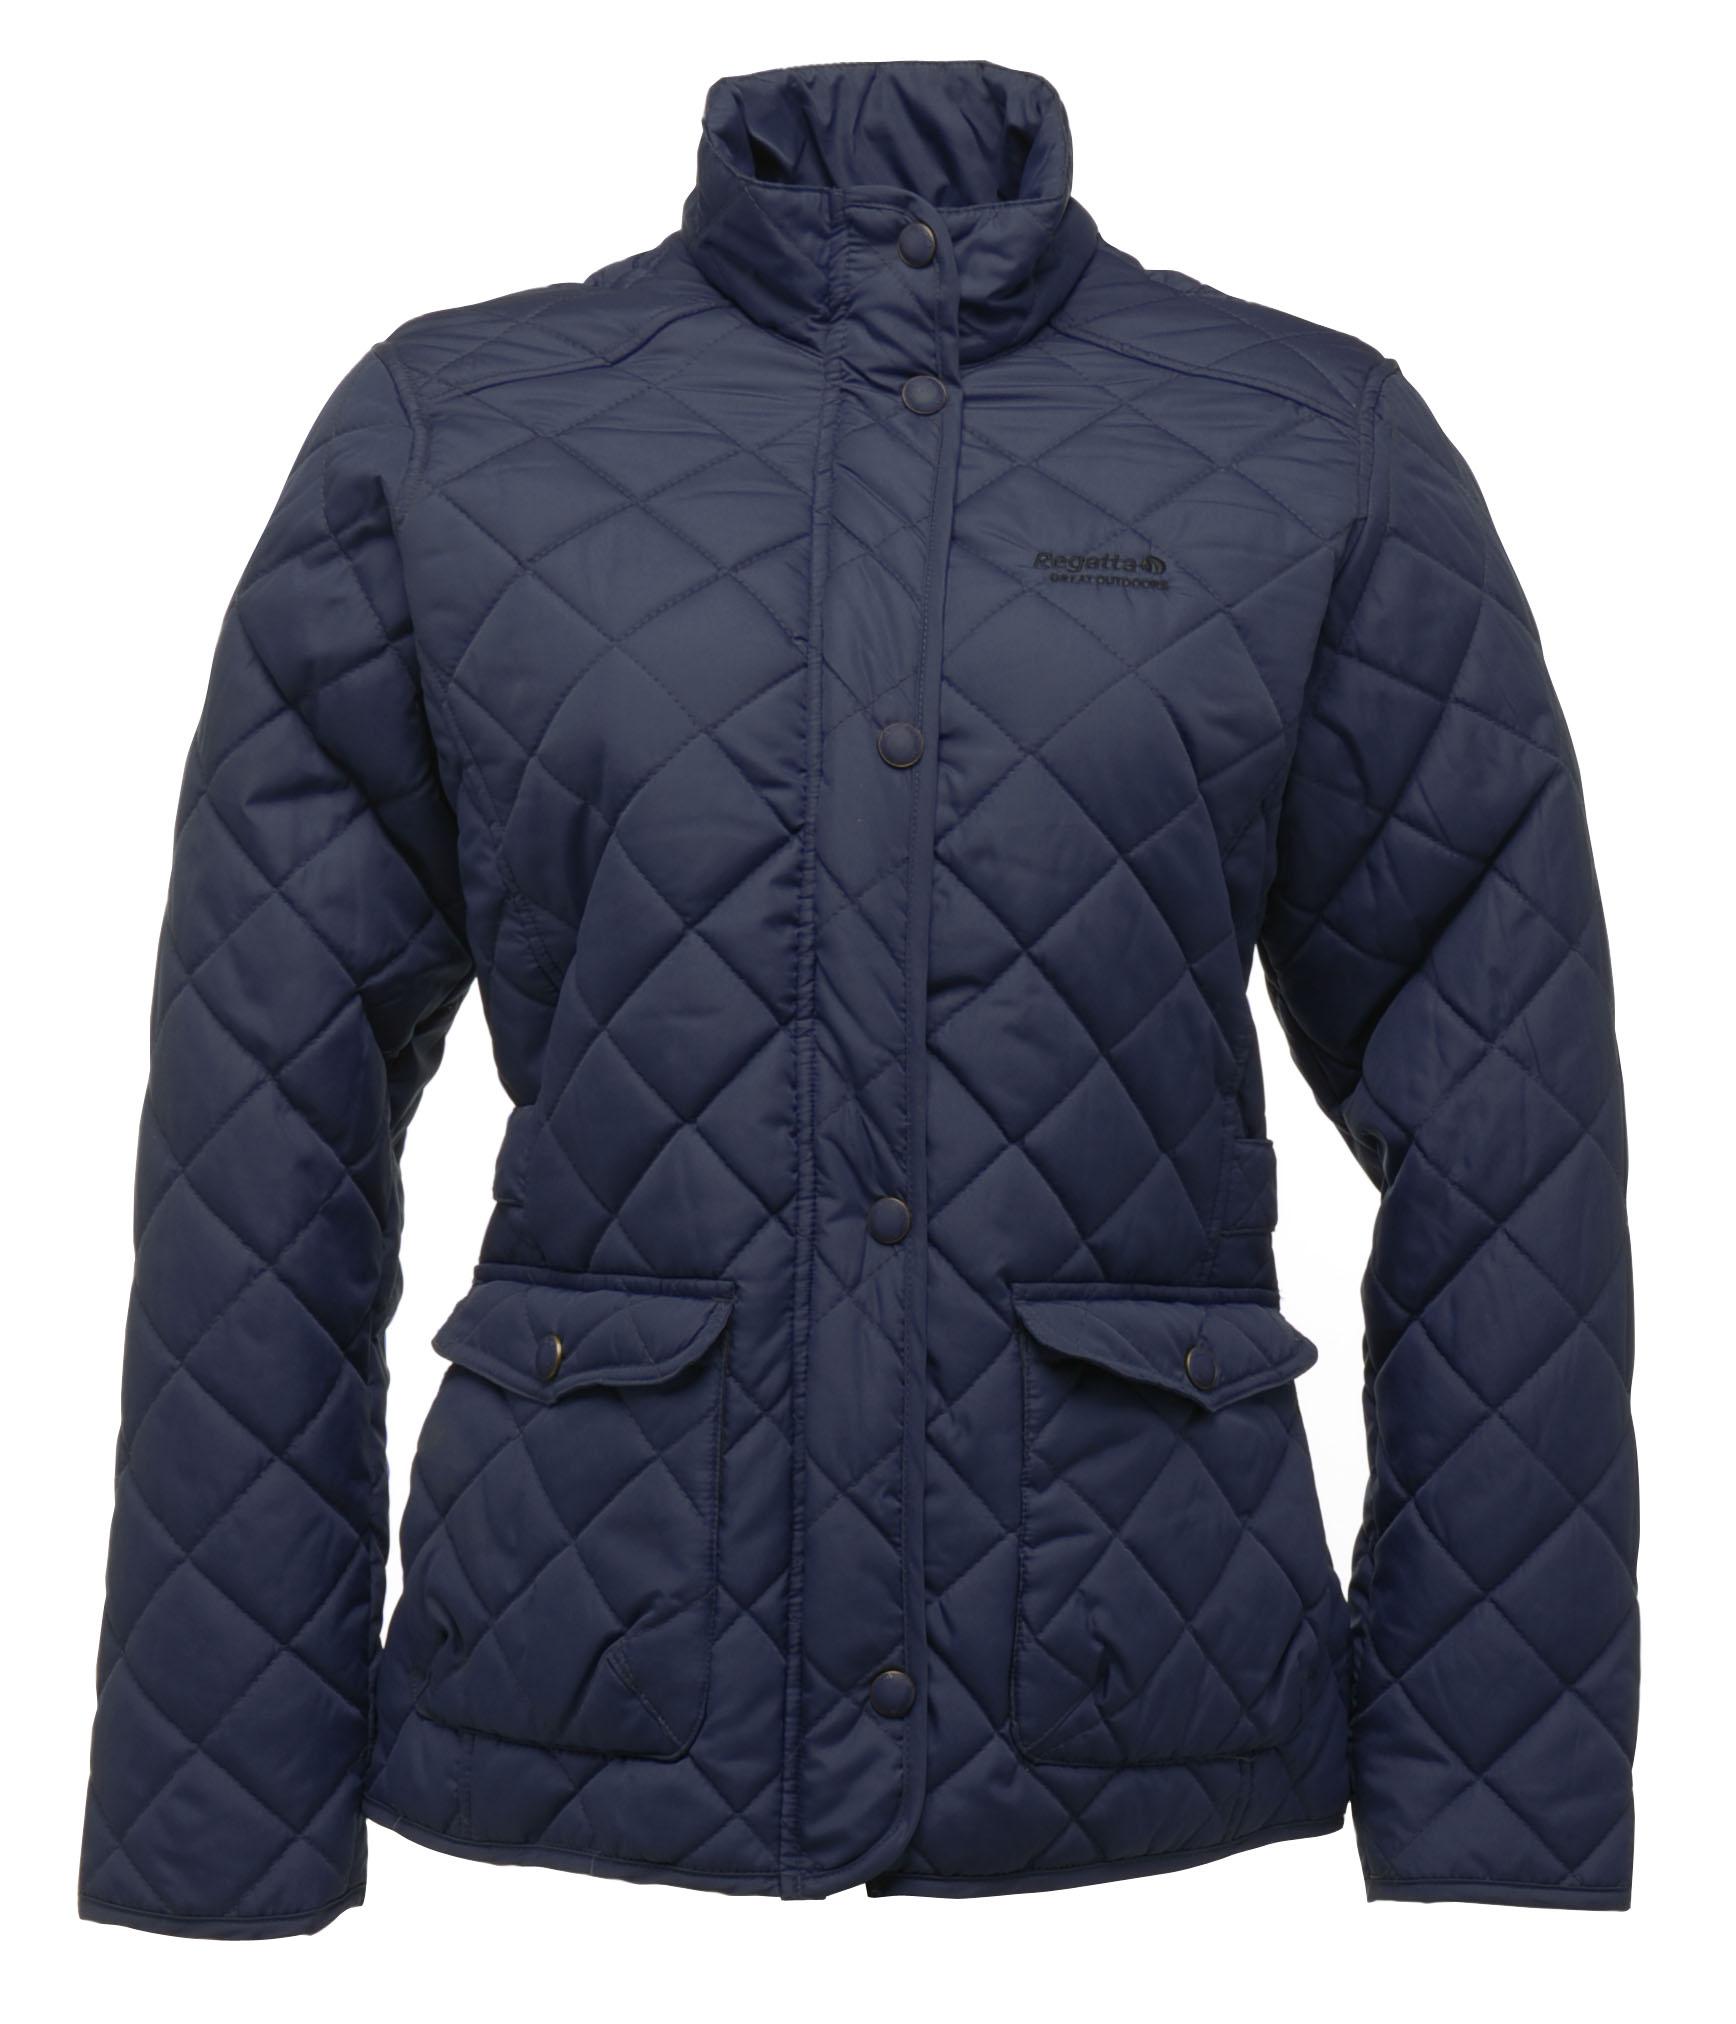 Women&39s Waterproof Jackets | Sale Prices | Berghaus | Craghoppers